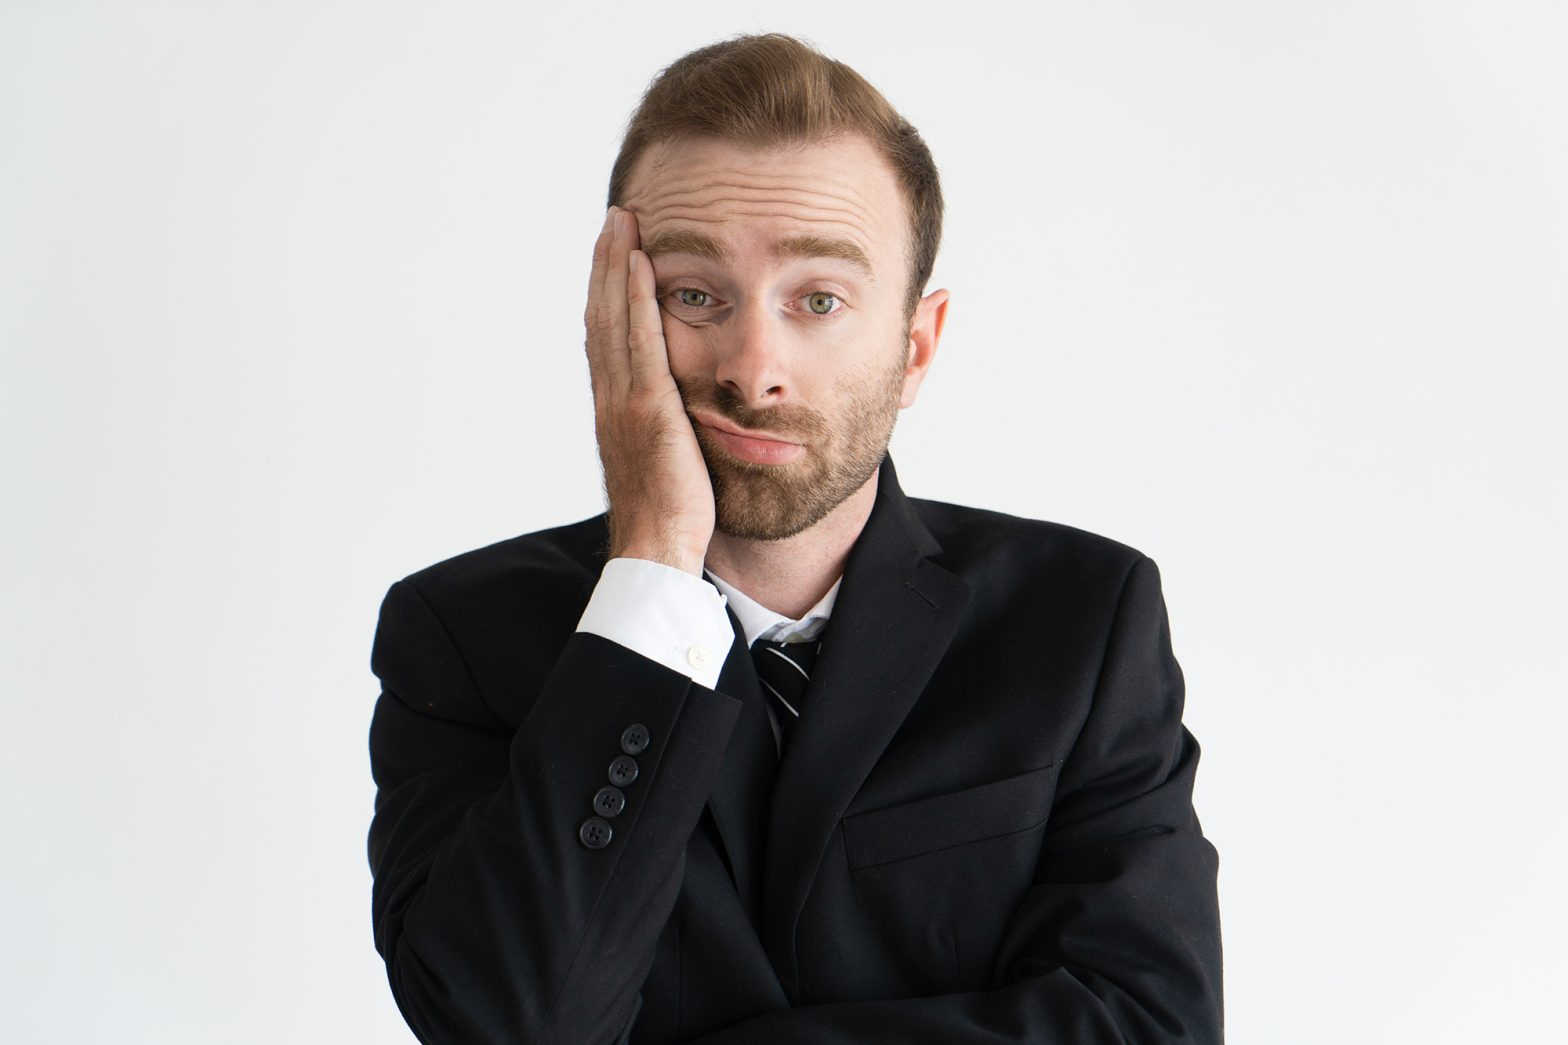 mentoring programs derail bored man